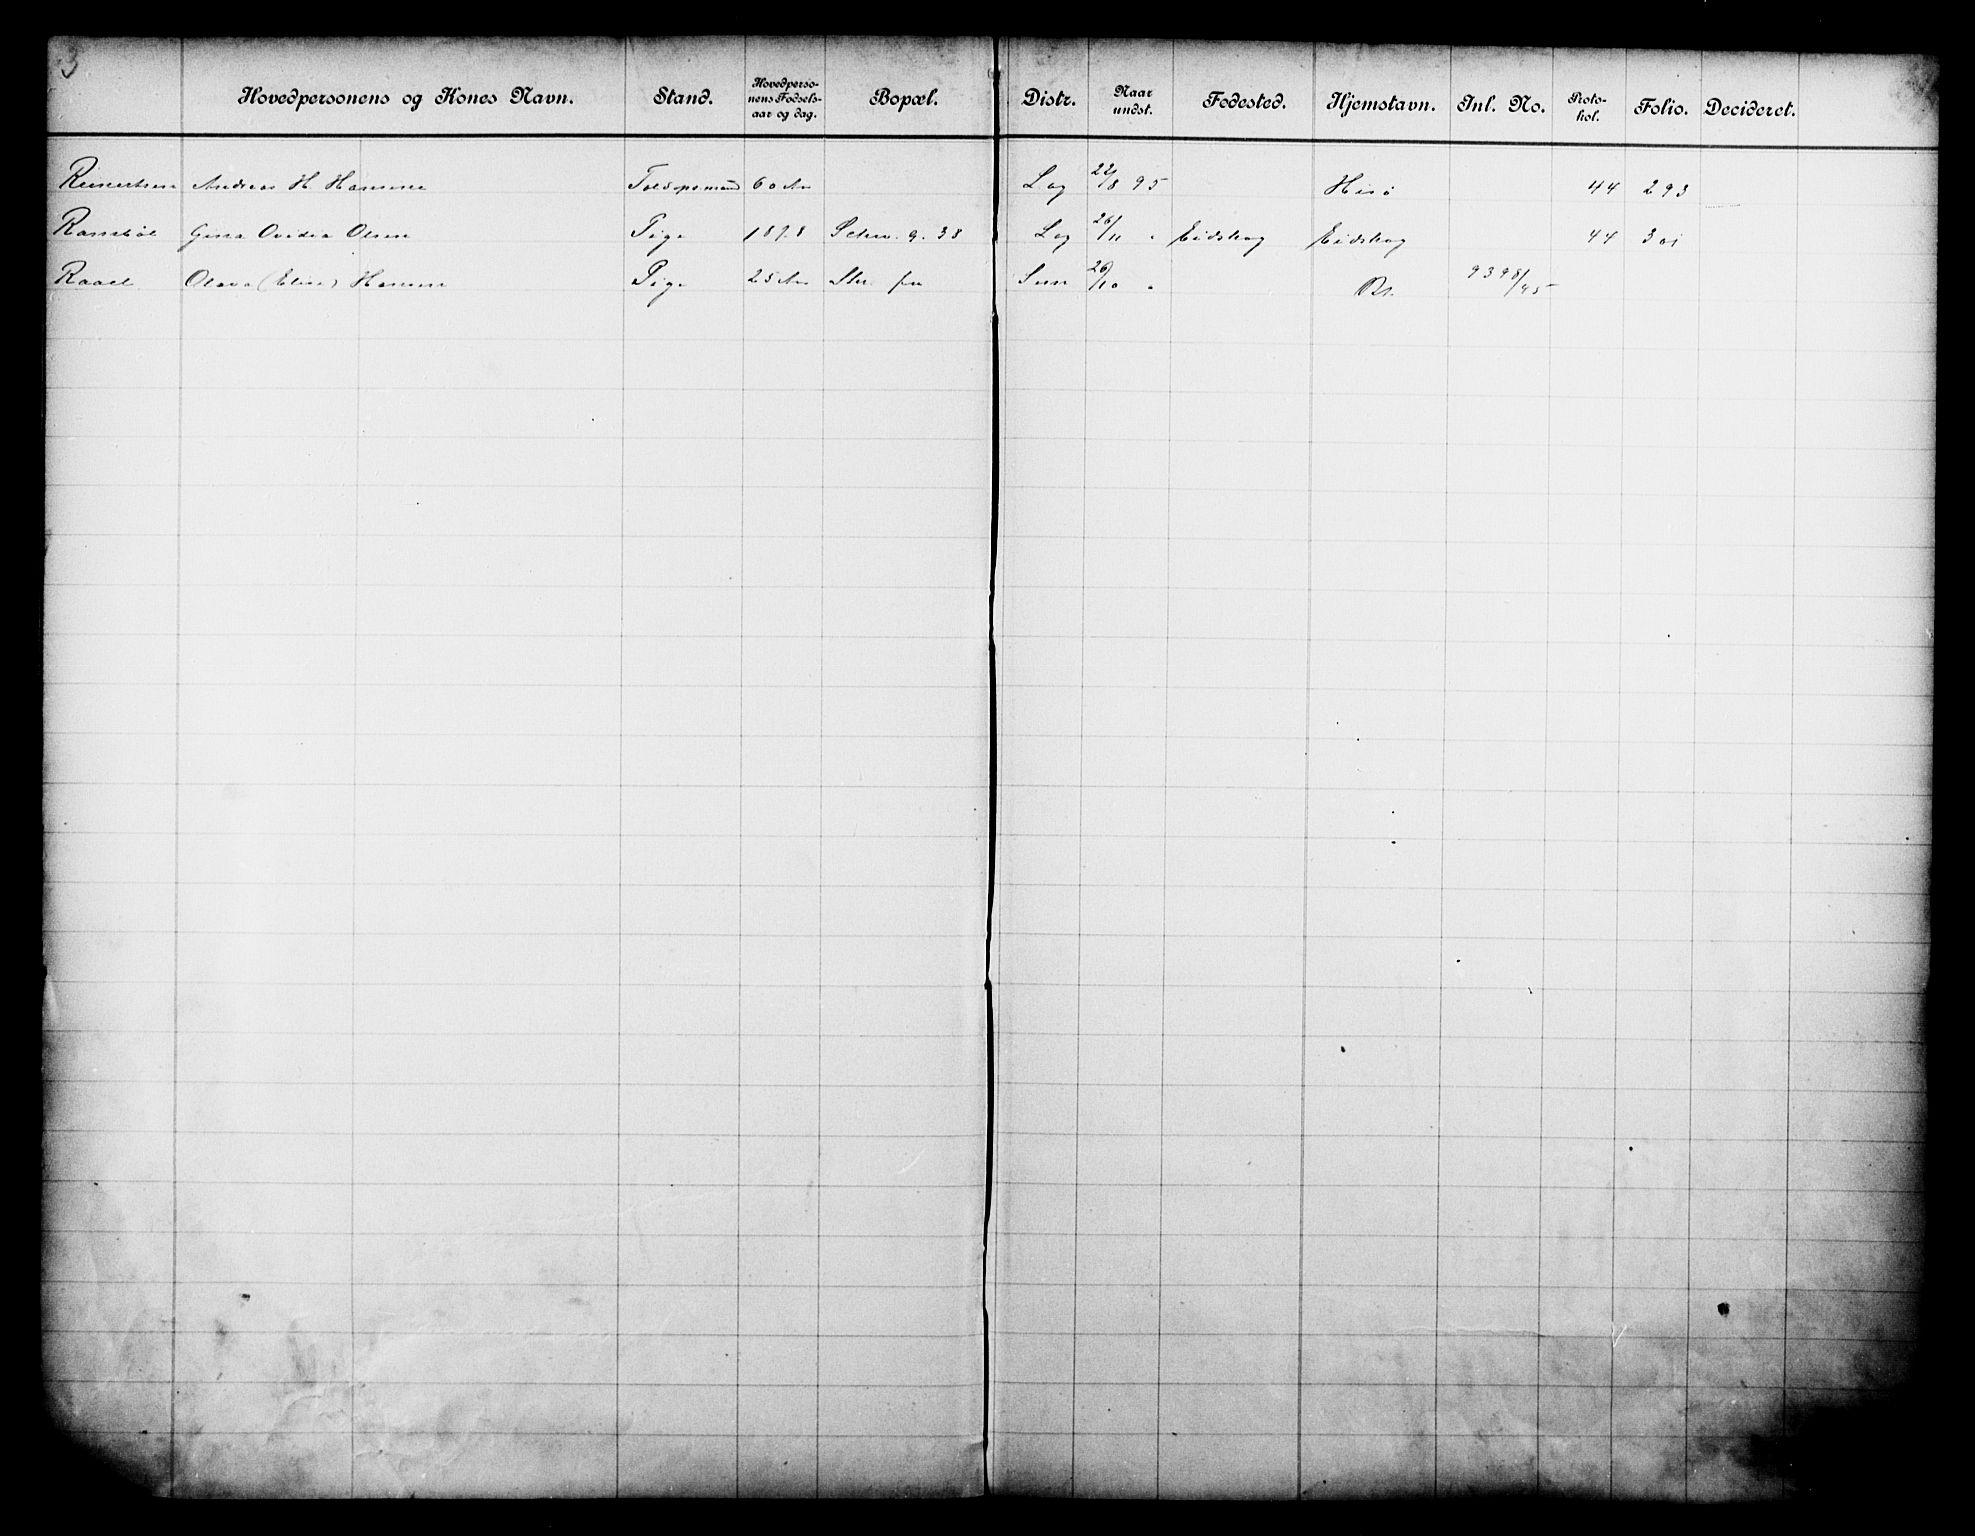 OBA, Fattigvesenet, Fb/L0015: Hjemstavnsregister, 1895, s. 175